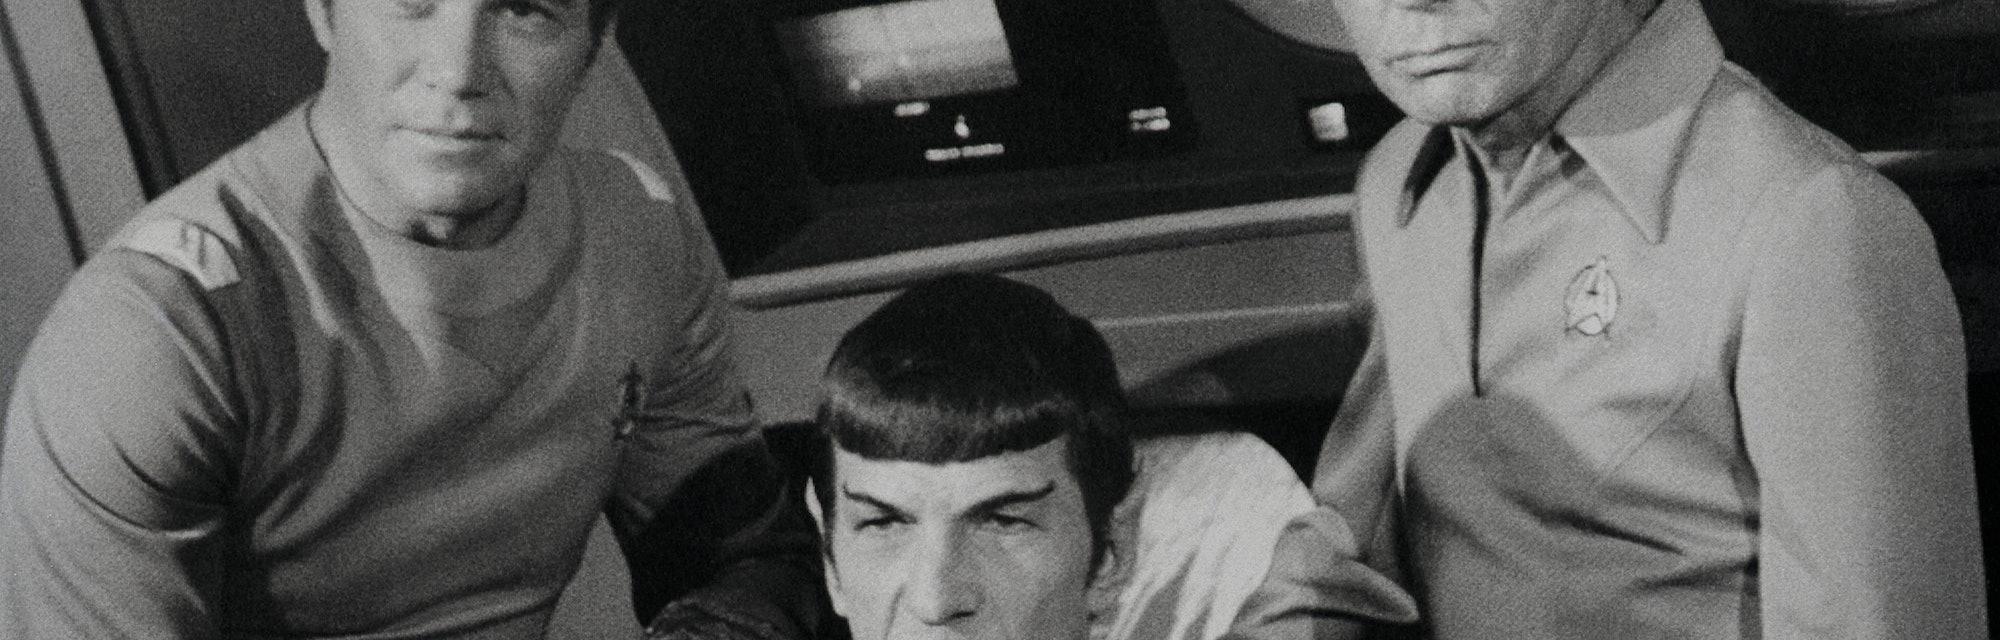 William Shatner, Leonard Nimoy, and DeForest Kelley appear together in the film Star Trek. Shatner p...